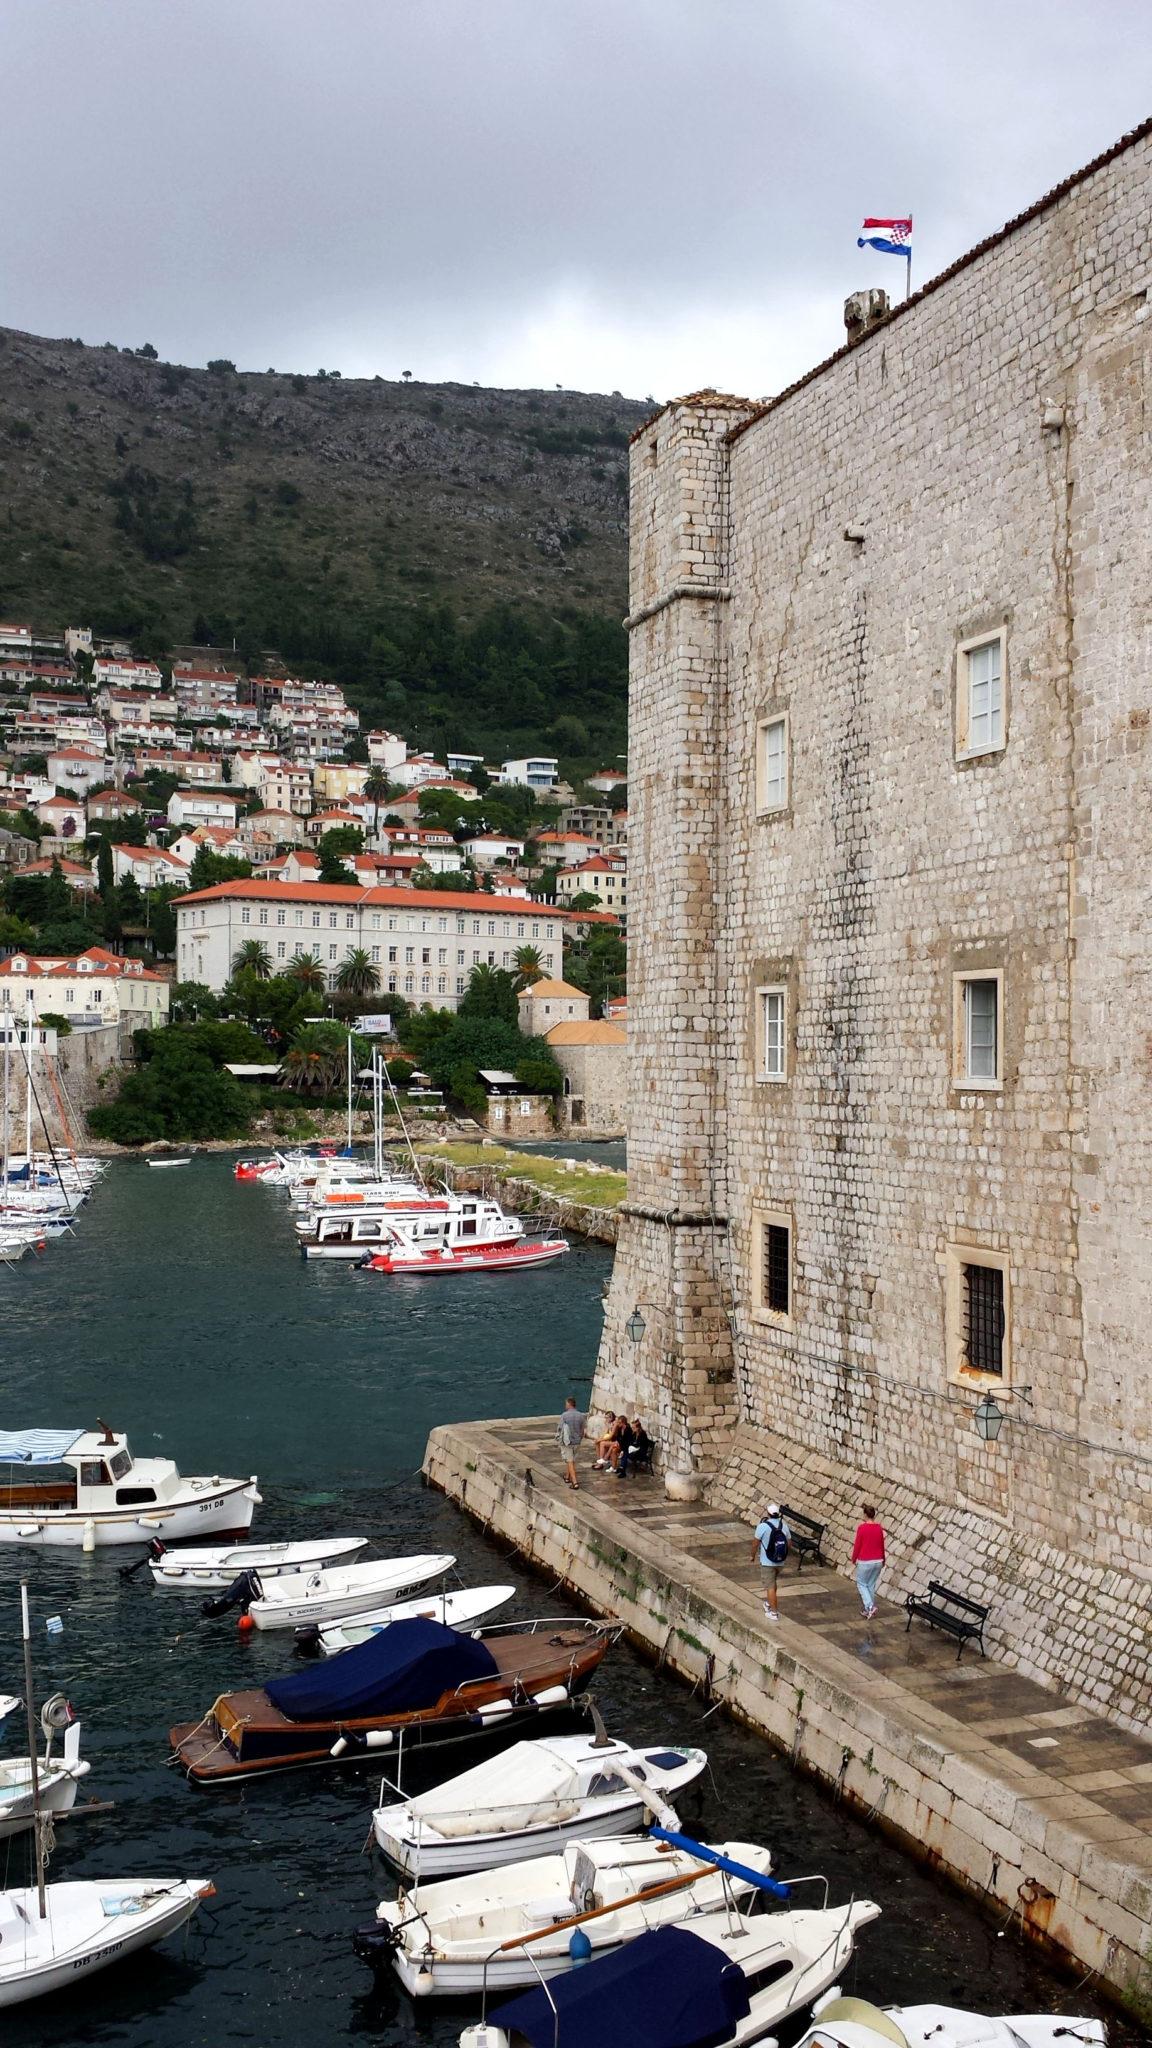 Hema_blog_mode_voyage_croatie_une_journee_a_dubrovnik_autour_port_16